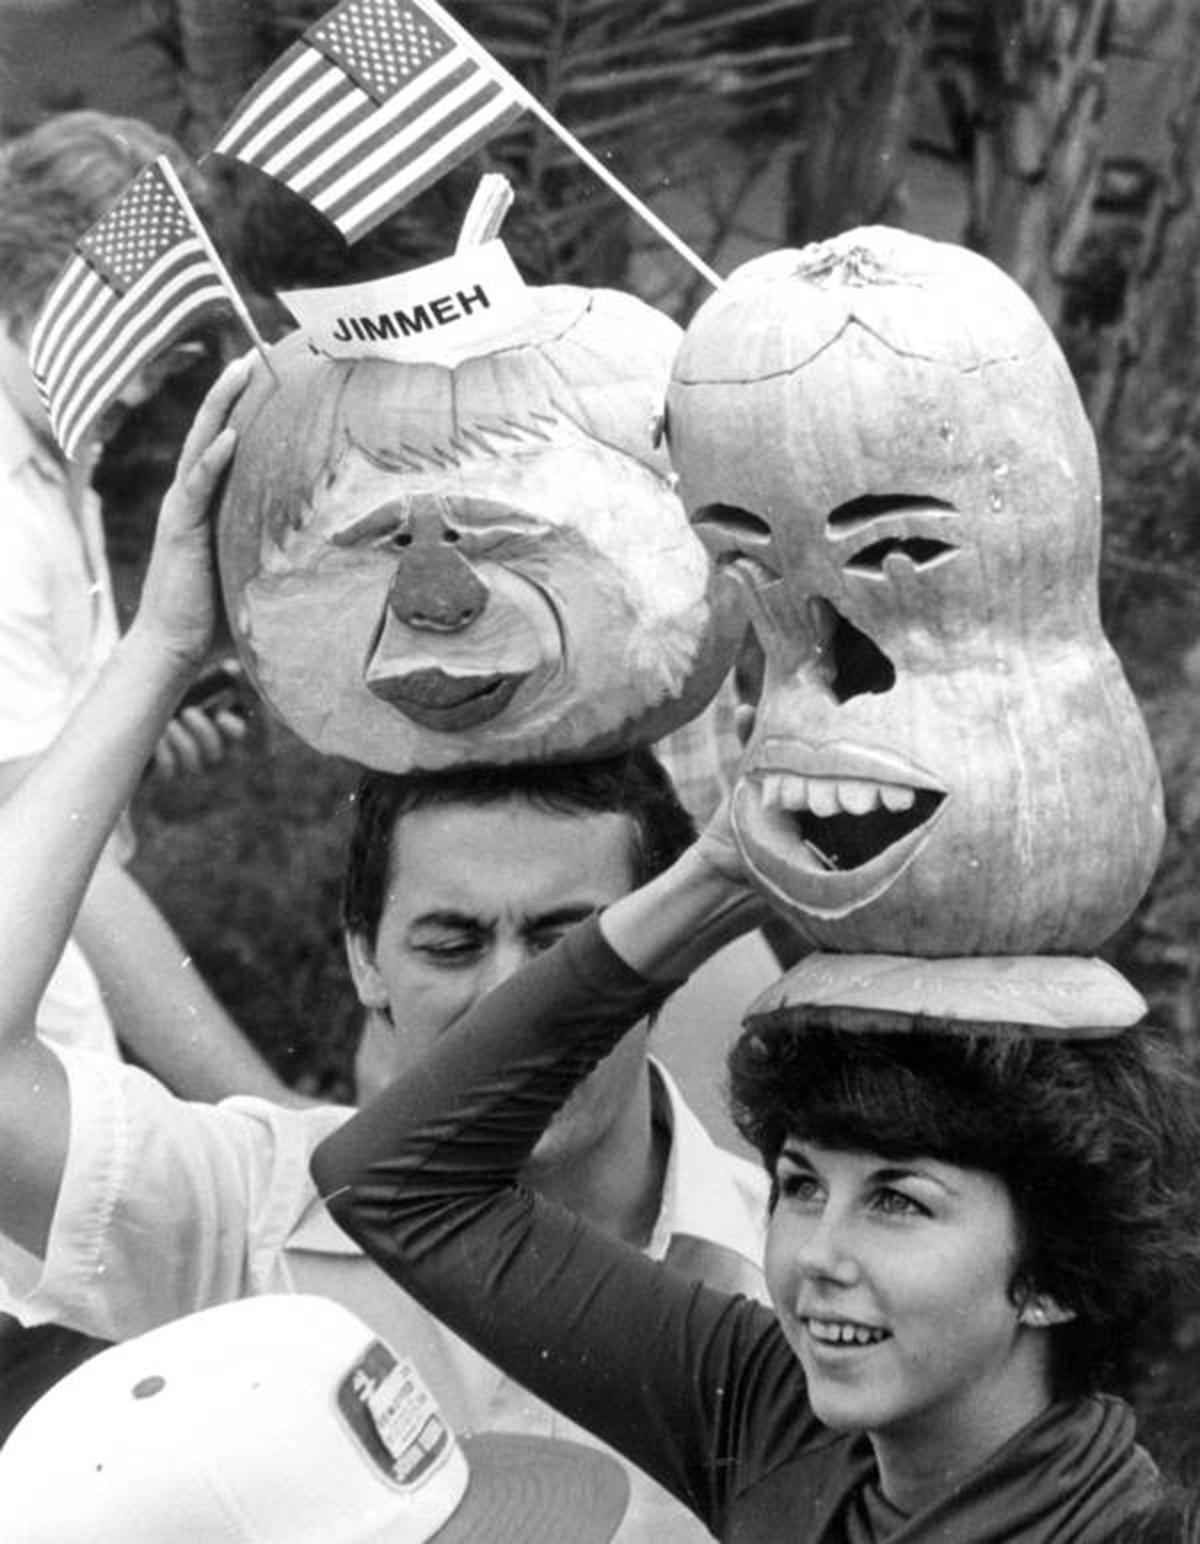 Pumpkins carved in the likeness of President Jimmy Carter in Polk County, Florida, October 1980, State Library and Archives of Florida via Flickr, https://www.flickr.com/photos/floridamemory/10554725056/in/photolist-7YvoG-5T4LFb-9L84Cp-dkZJrj-2ZWj62-2PZWZy-2PVsYB-dpHgKe-h5FJ3d-63diMF-dUscrS-8Xrcgm-2PVujx-BtVQR-2ikusL-8SqgFG-9YhFMv-9Y2e3M-8Xrcm5-6raVQ1-8ELVDa-868hpW-5ZqsiS-9BY7r8-nvHn8g-5suU6Y-5suW69-3gEeUd-vTudu-cPabXu-4xsepv-2PVuEZ-2PVtzR-cPaaTj-yeSxD-m3veAn-nvHDjq-8ESf1U-7nPjSi-2PVws4-nNaapU-868inq-8vhd9Z-9tjaTo-f9Ardt-4FYKJ8-cQk1Co-f8deRv-5nQJeN-dUmA4a.